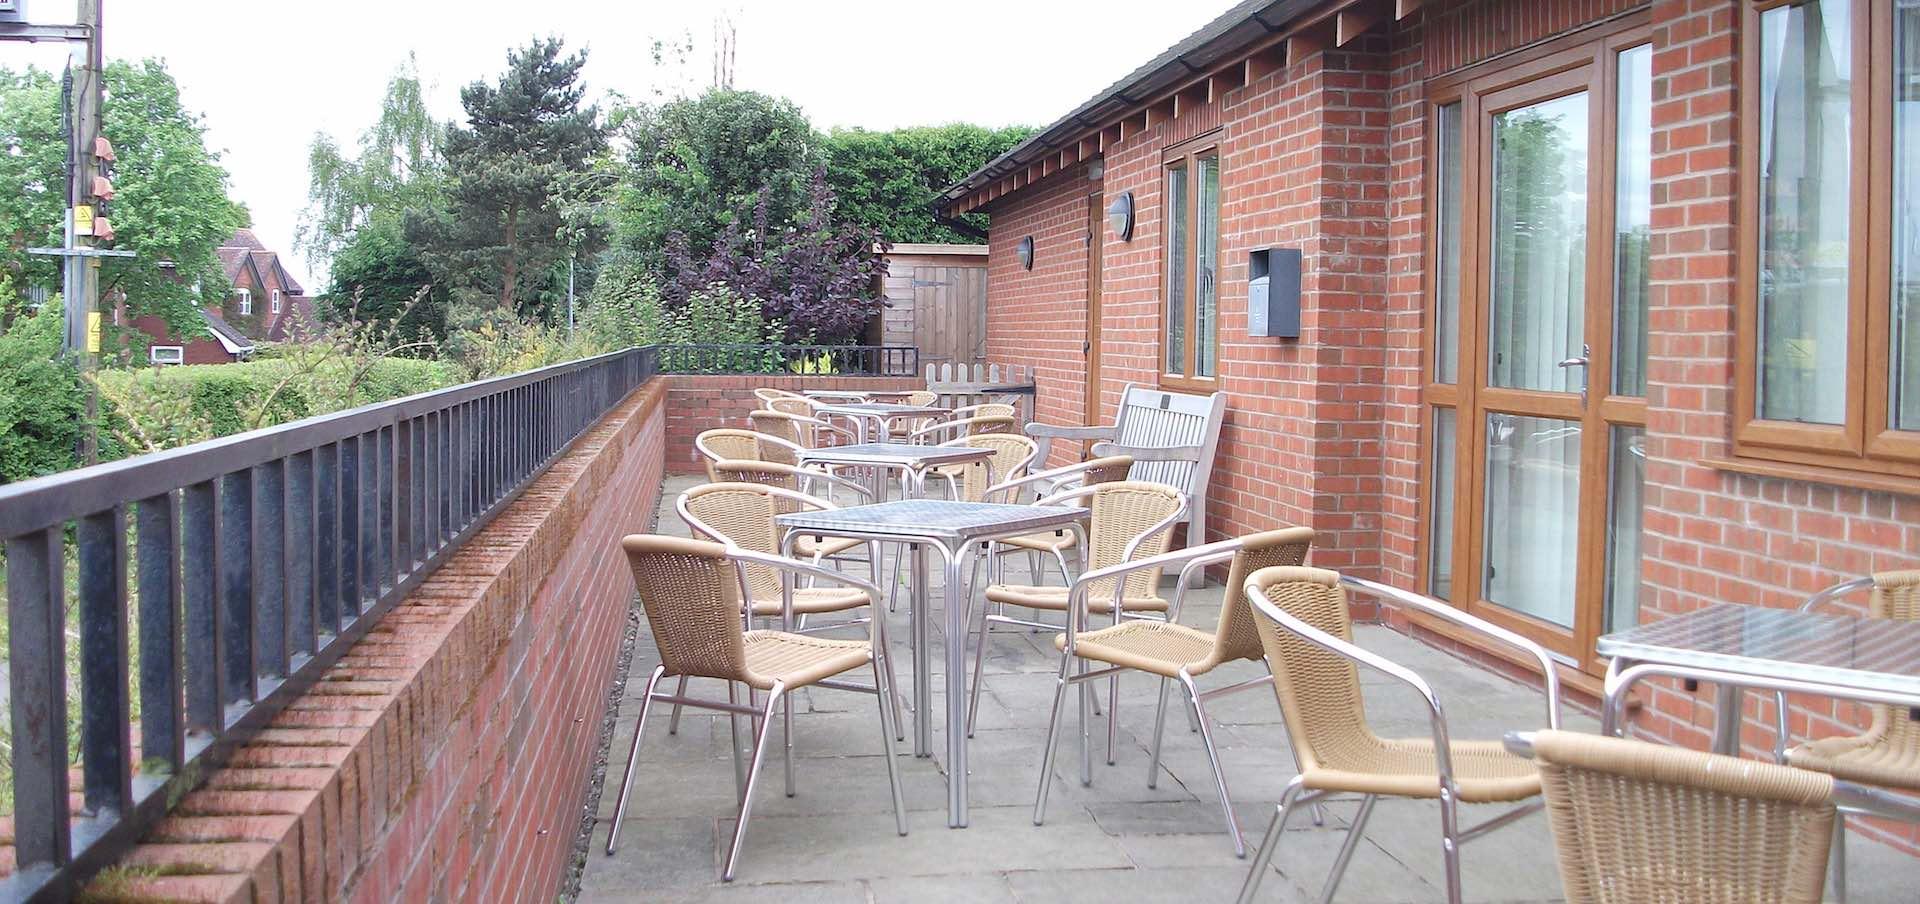 Blymhill and Weston Under Lizard Village Hall Facilities 5